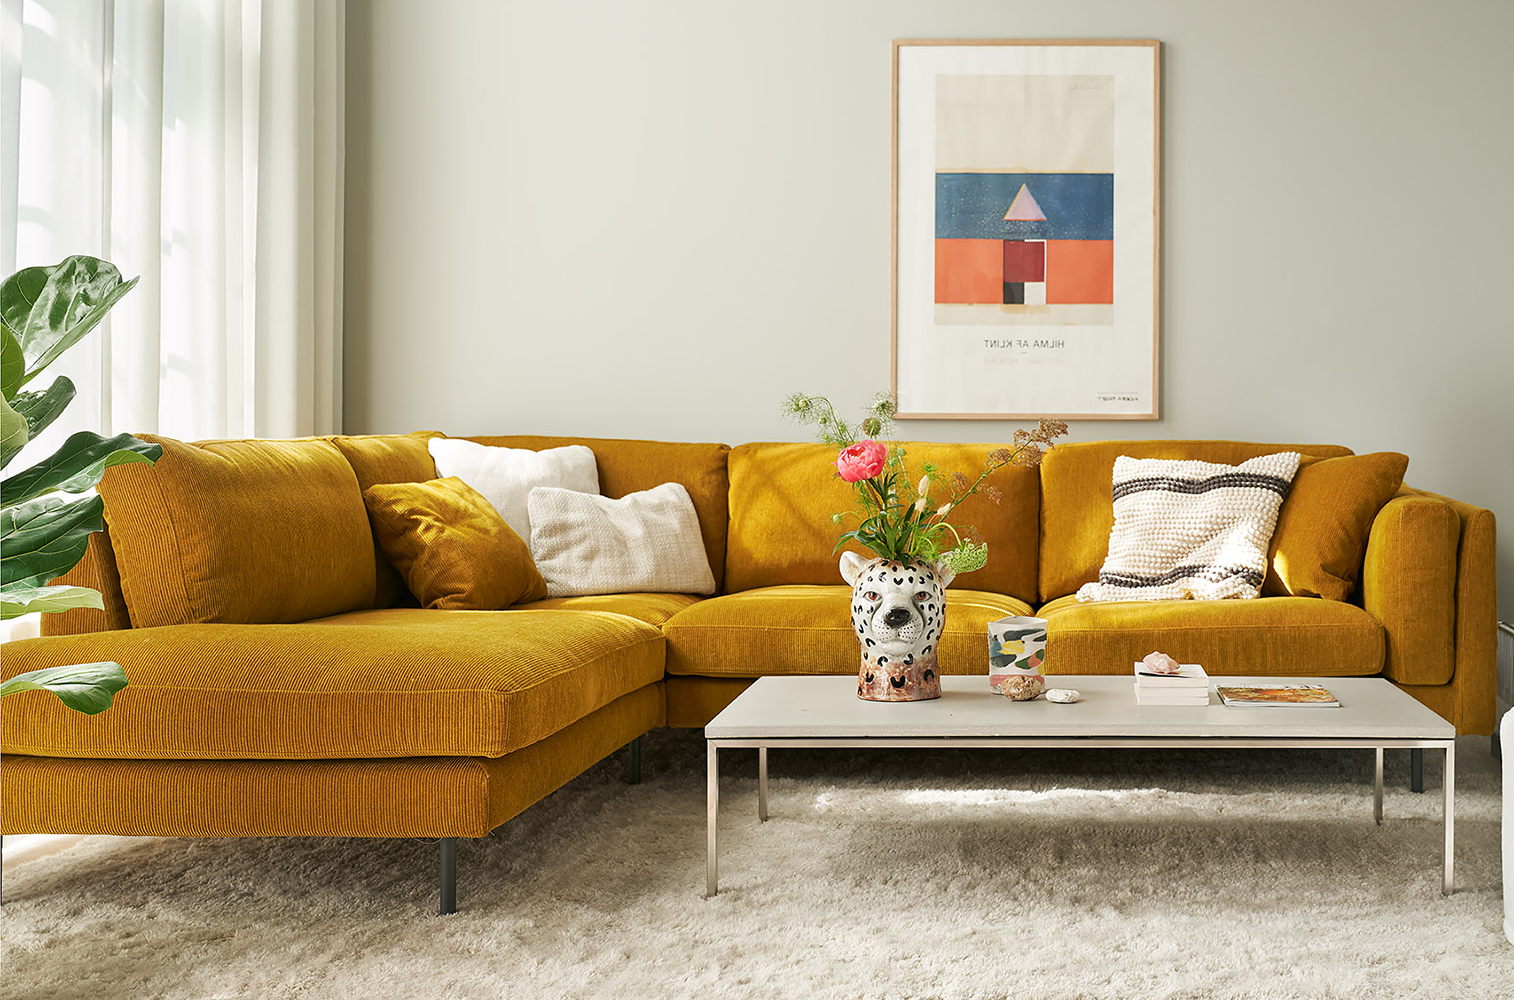 Picture of: Modern Sofa Designs Interior Design Design News And Architecture Trends